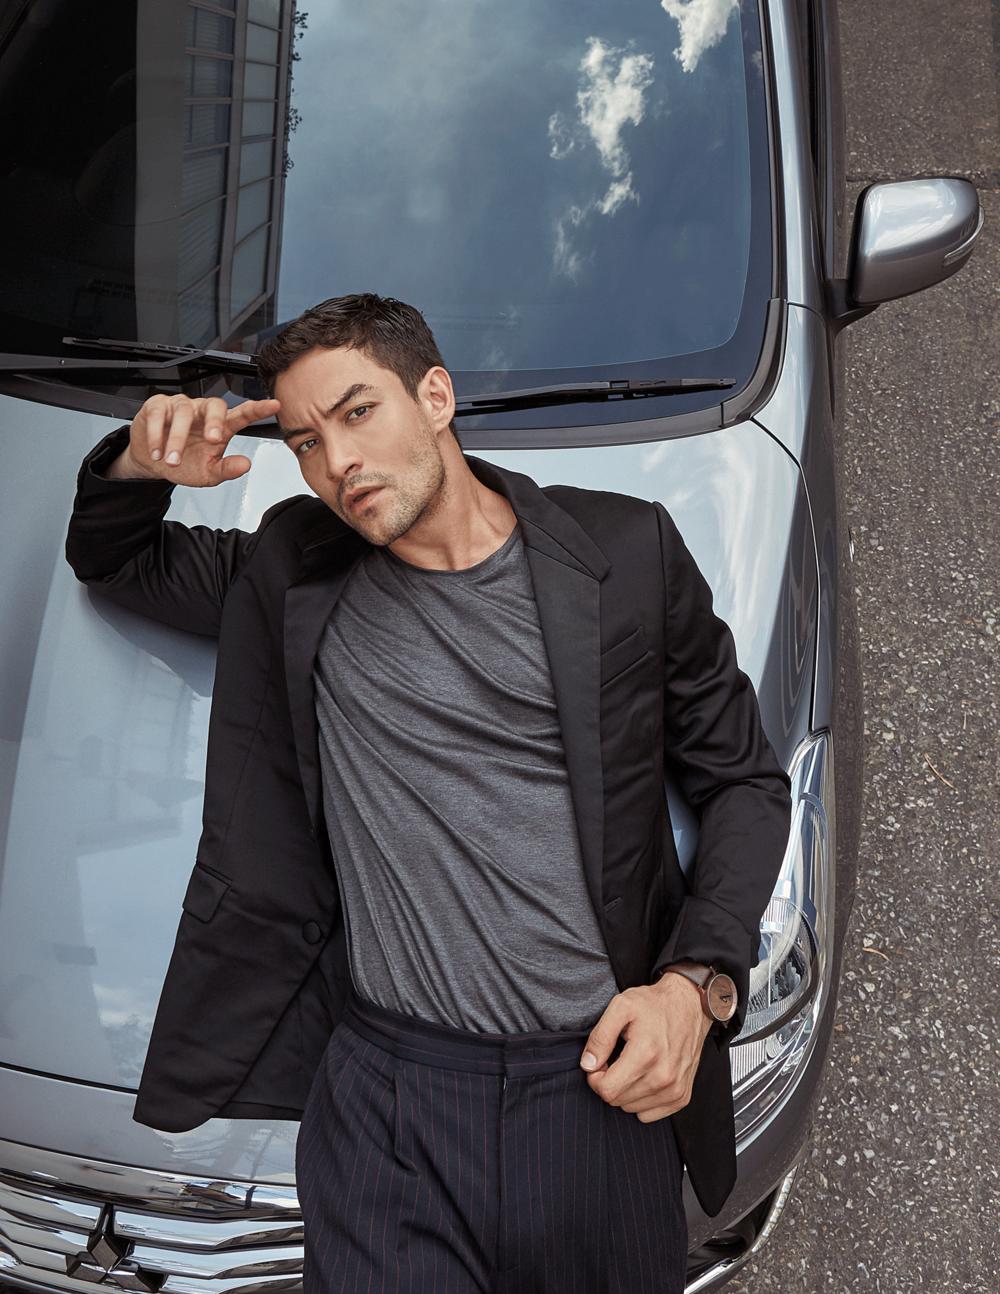 car : Mitsubishi NEW Attrage  jacket : GIVENCHY / tshirt : SARIT / watch : FORREST